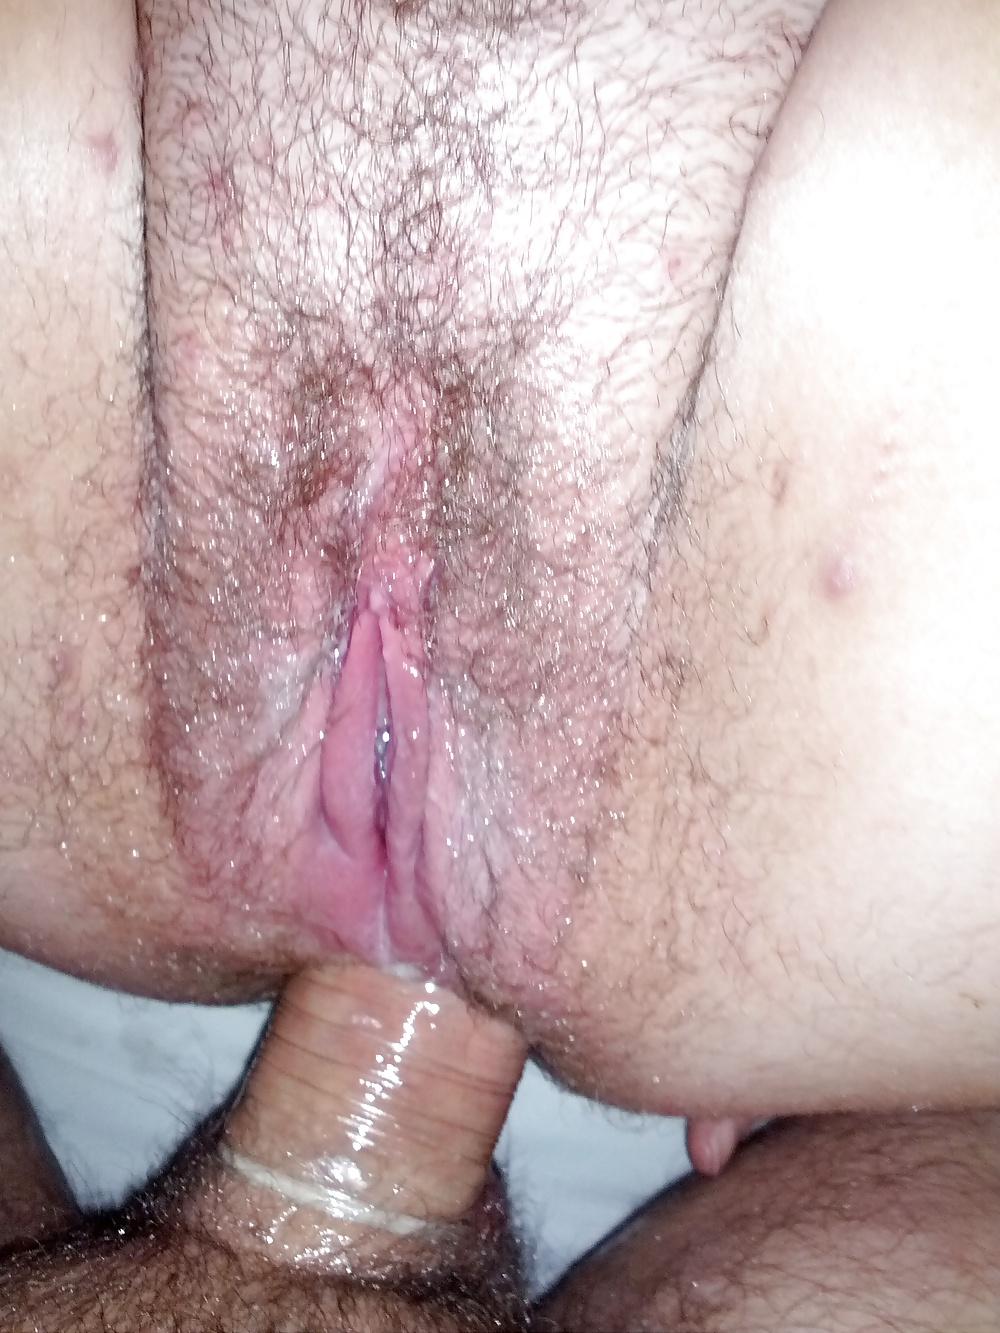 Maricar reyes naked pussy